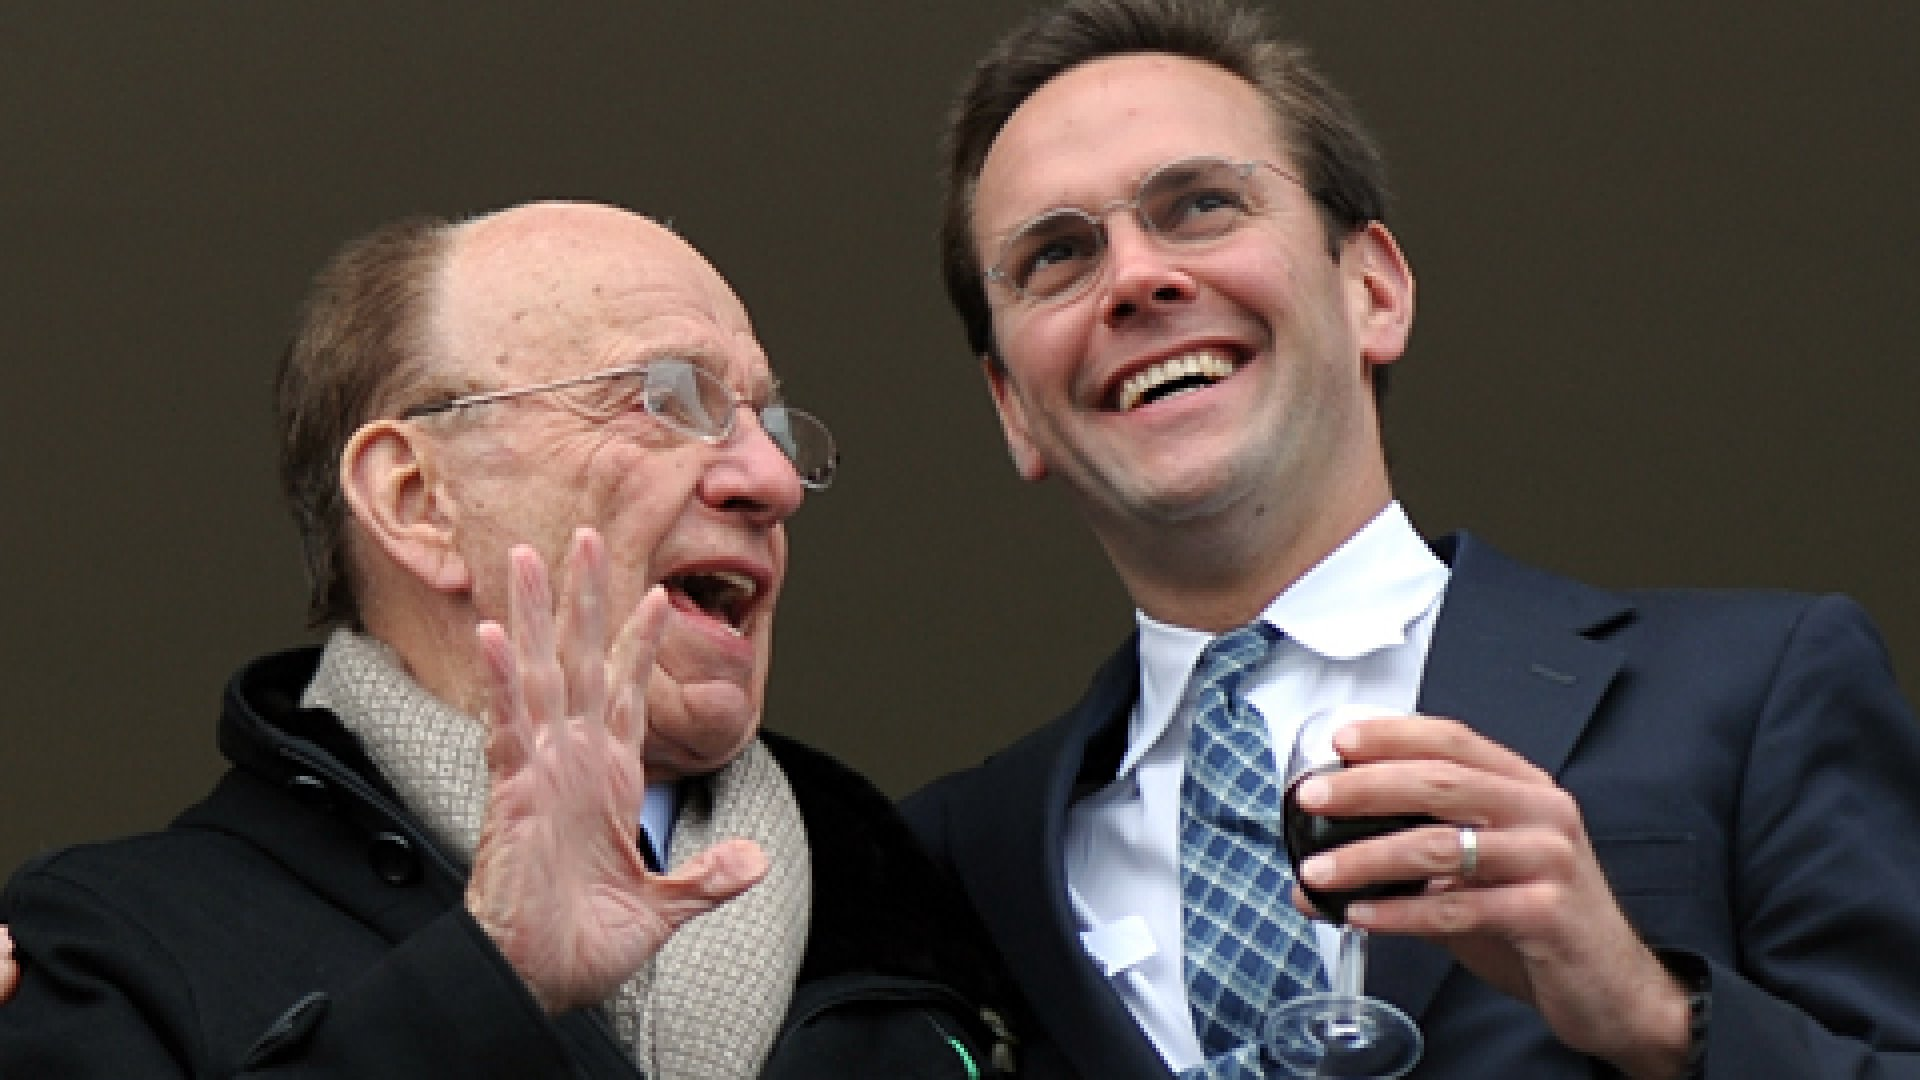 Media mogul Rupert Murdoch stands beside son James Murdoch on a balcony overlooking a Cheltenham Festival horse race in March 2010.